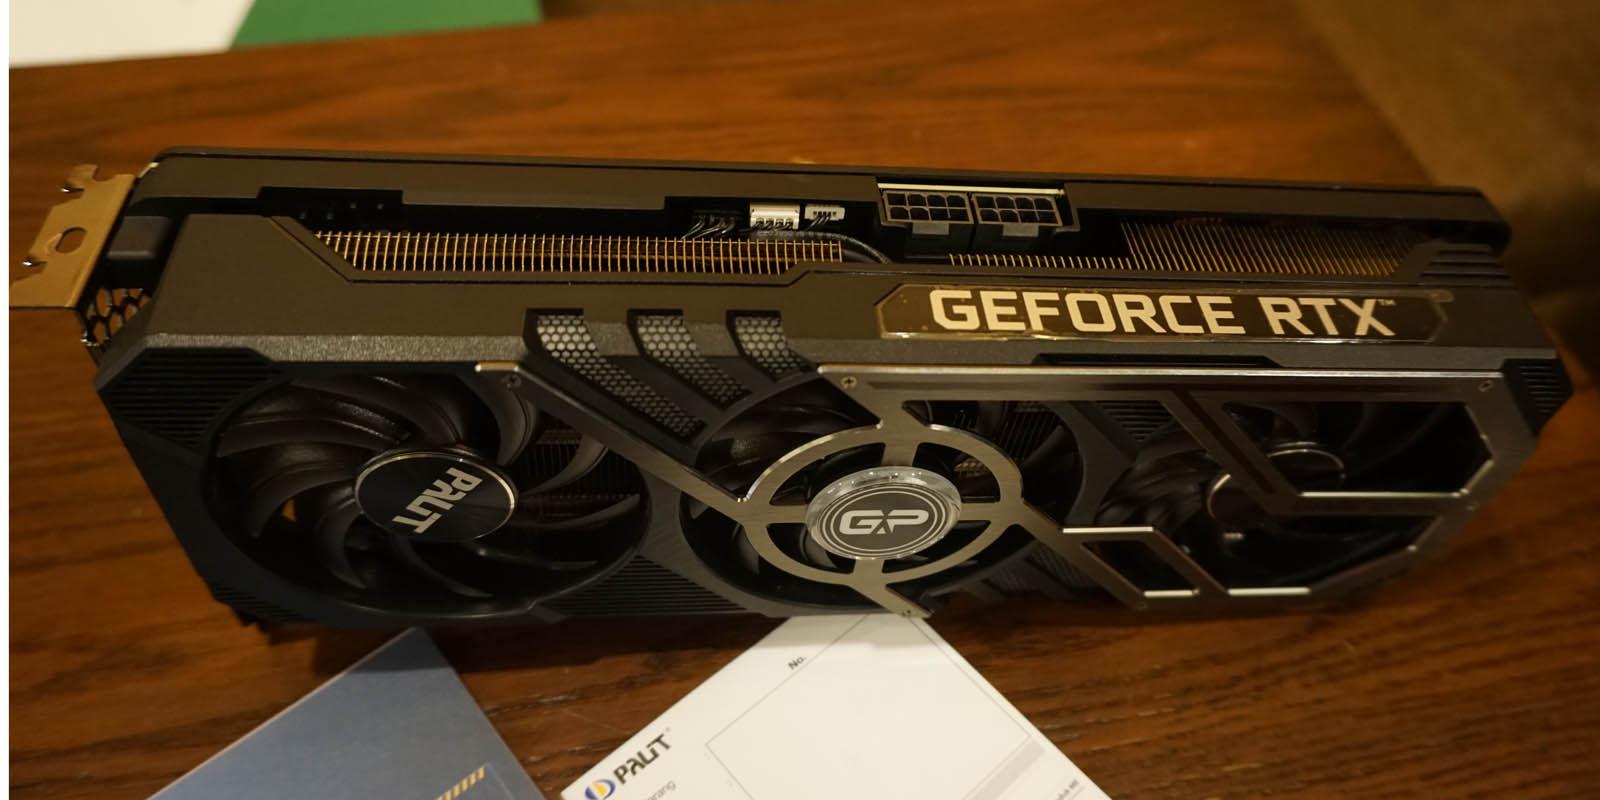 Review Palit GeForce RTX 3070 GamingPro OC - Design 02